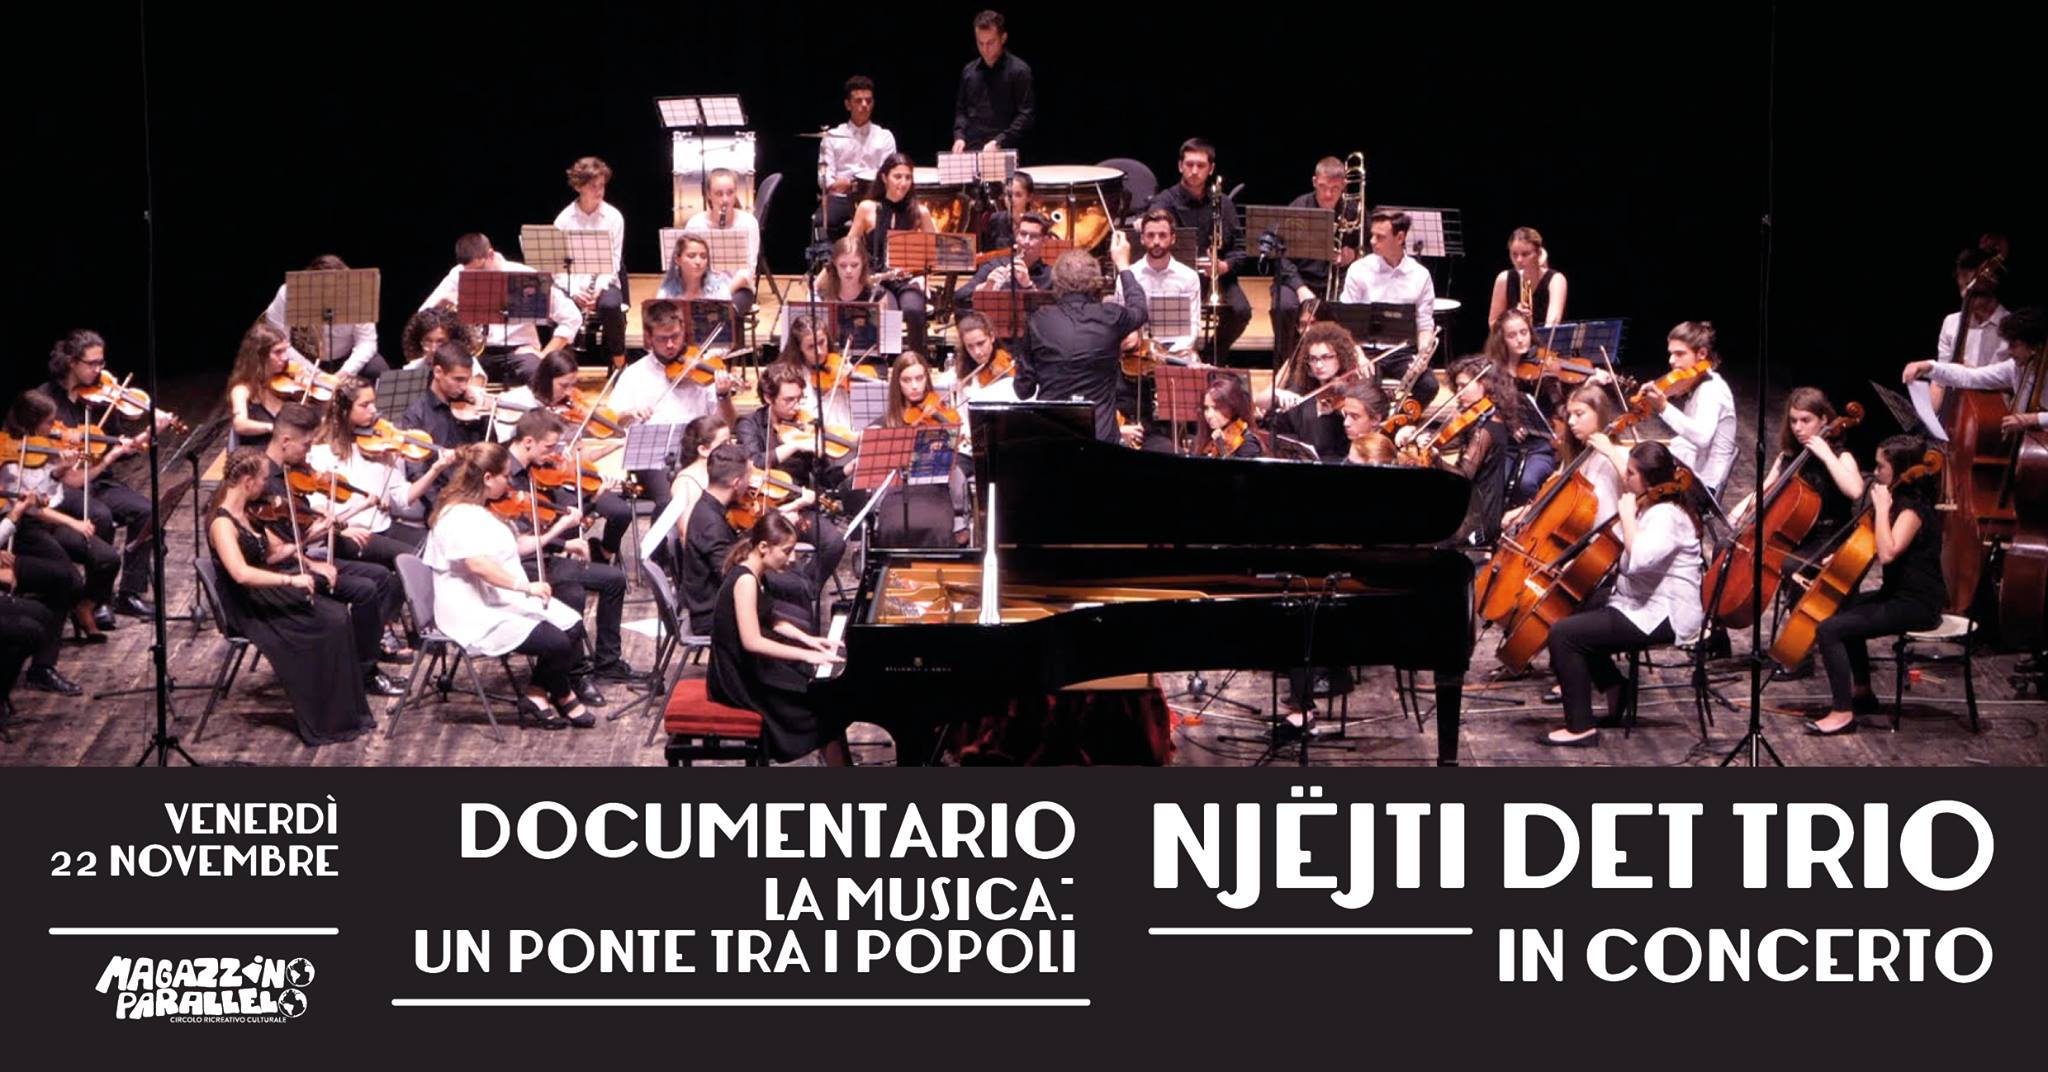 Un ponte tra i popoli - Njëjti Det Trio / at Magazzino Parallelo